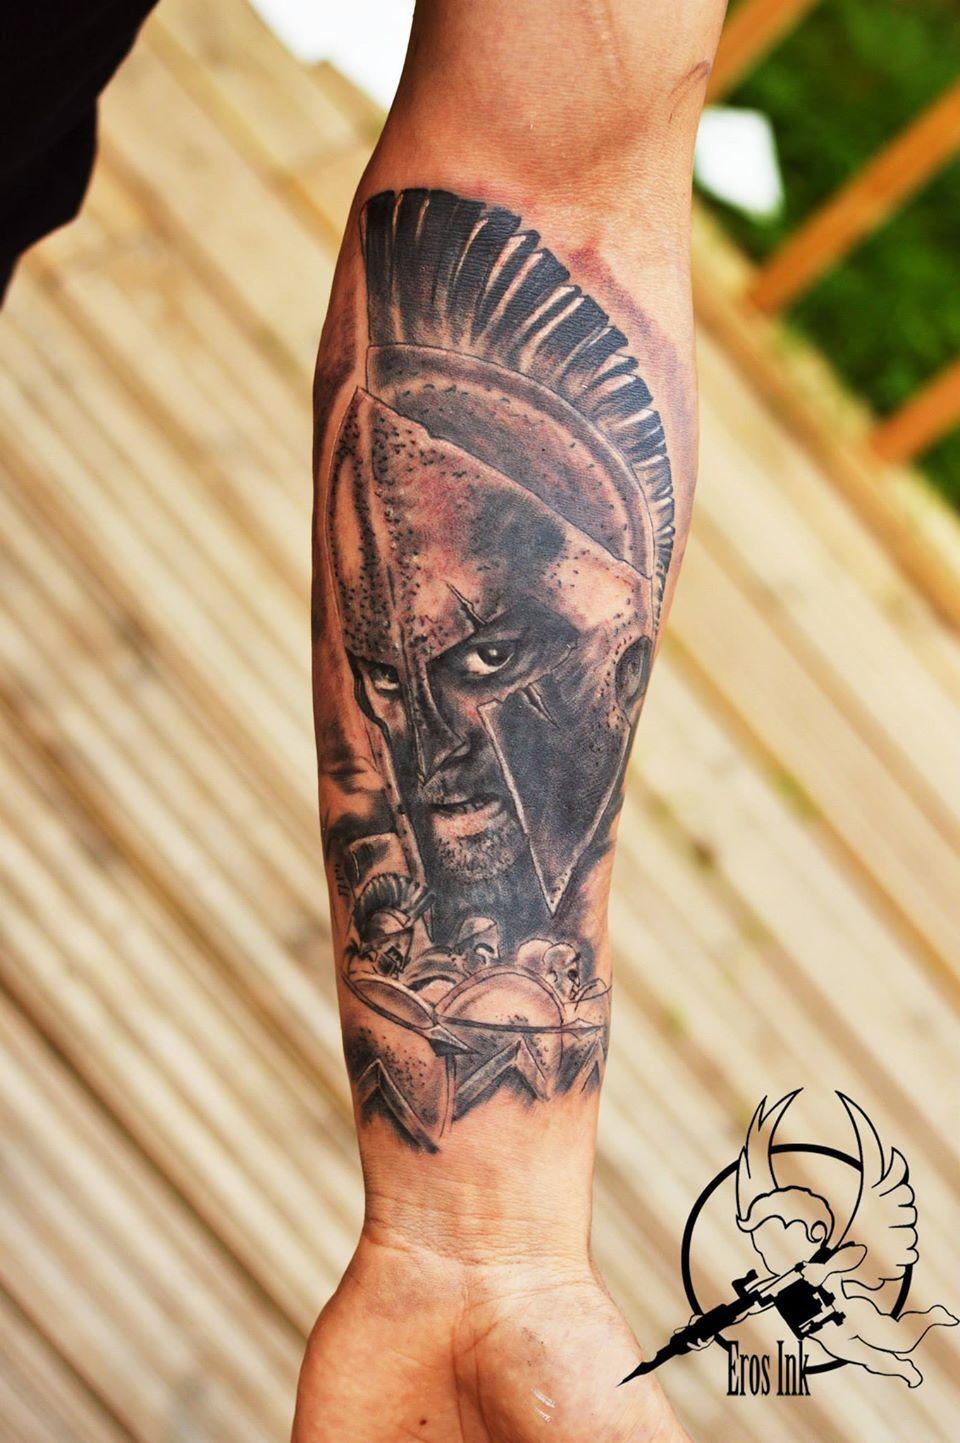 300 spartan tattoo spartan warrior tattoos pinterest tatuaje espartano y tatuajes. Black Bedroom Furniture Sets. Home Design Ideas